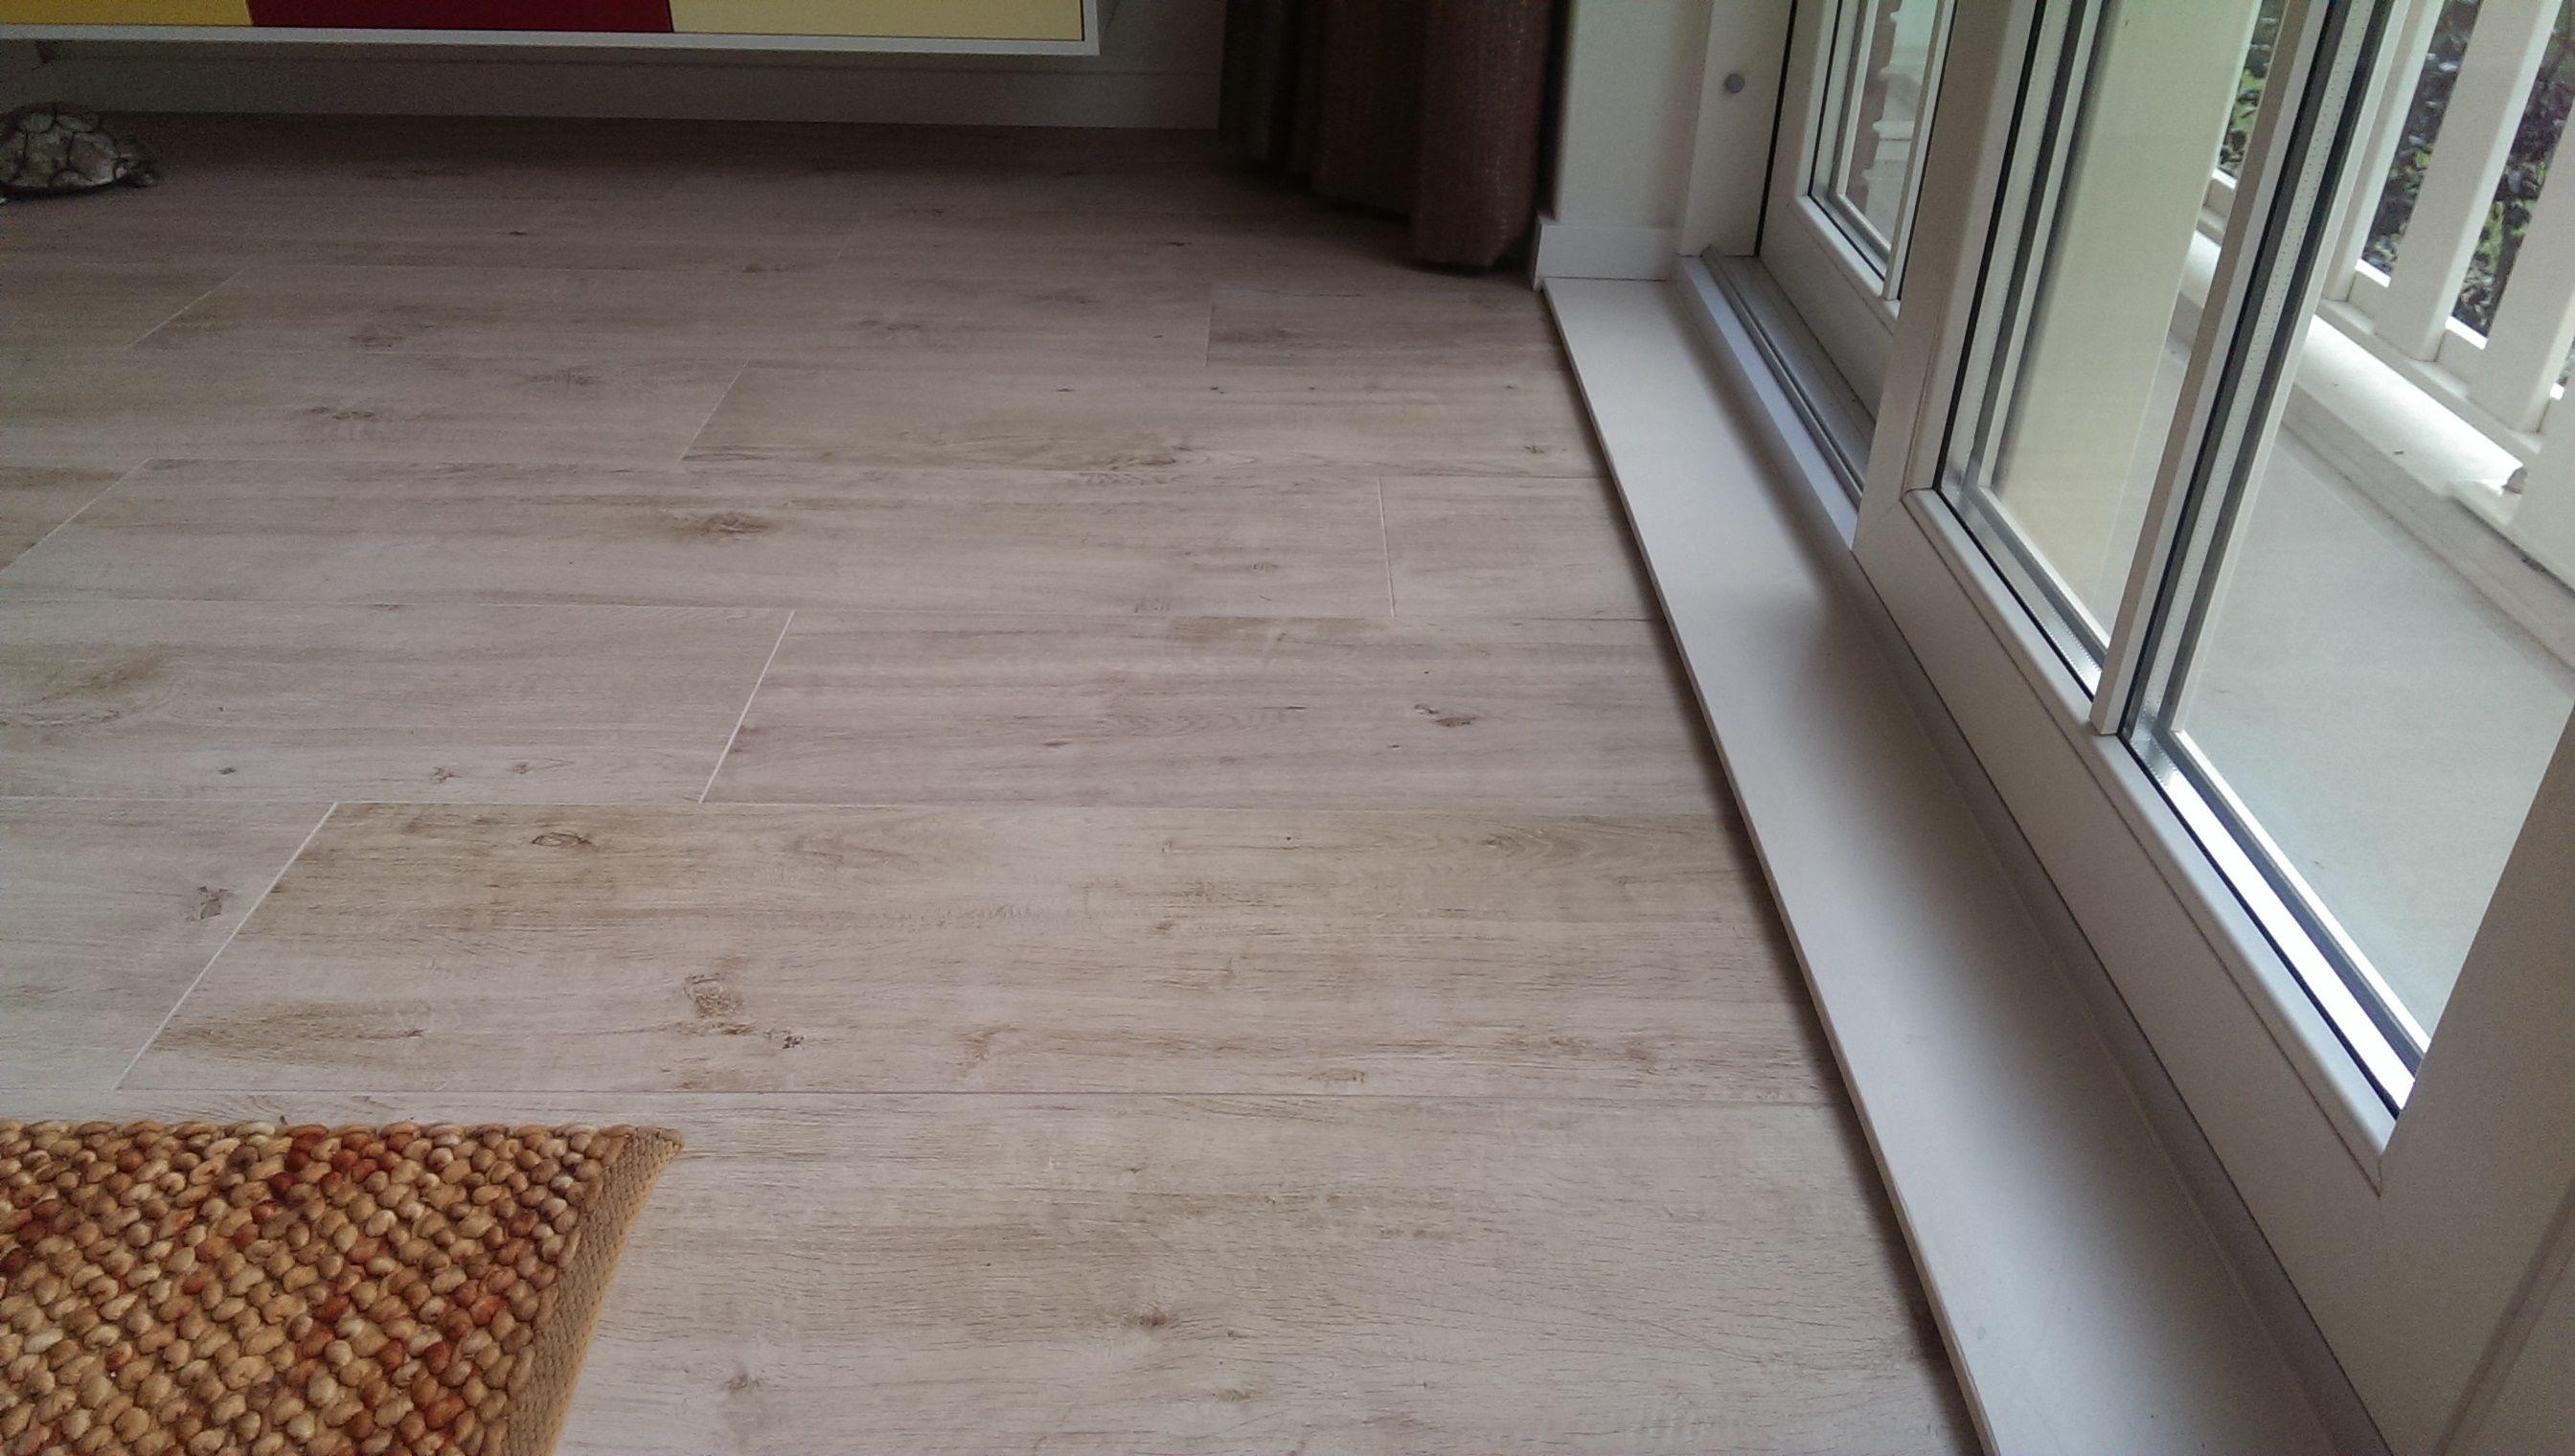 marazzi treverk home bettula 30x120 cm hausideen. Black Bedroom Furniture Sets. Home Design Ideas